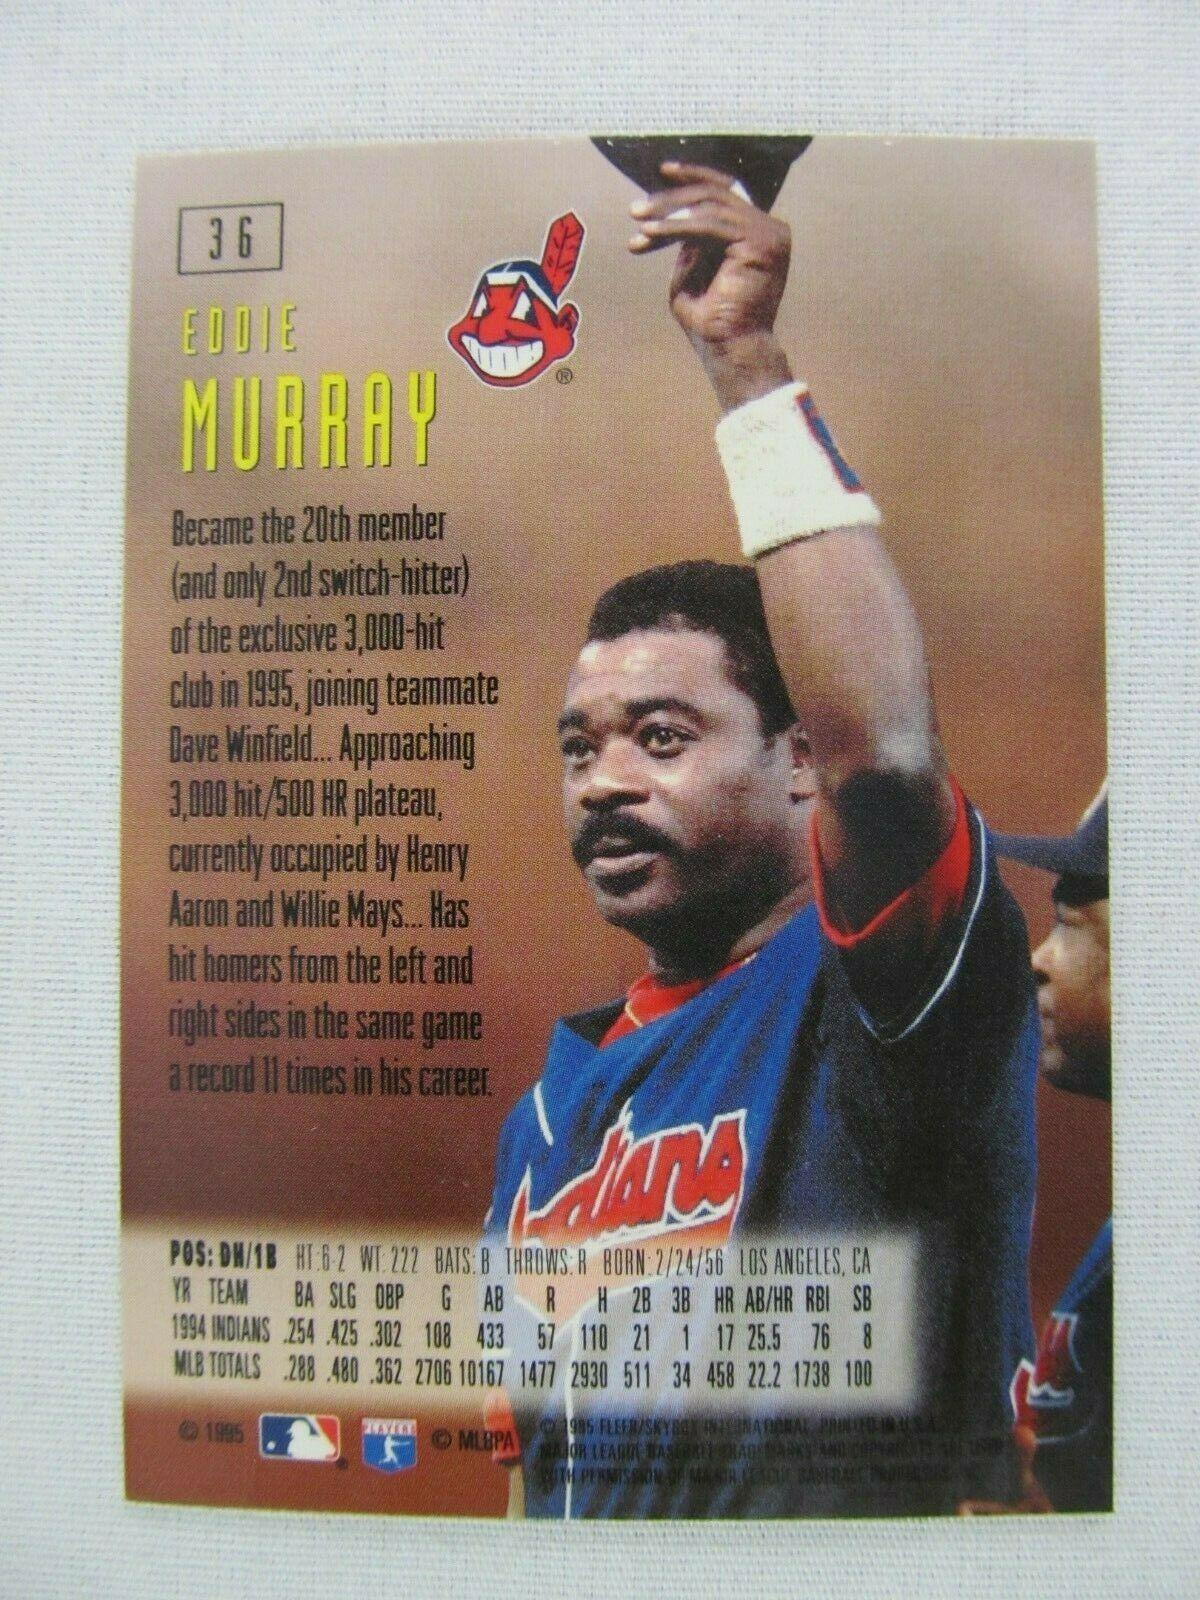 Eddie Murray Cleveland Indians 1995 Fleer Baseball Card 36